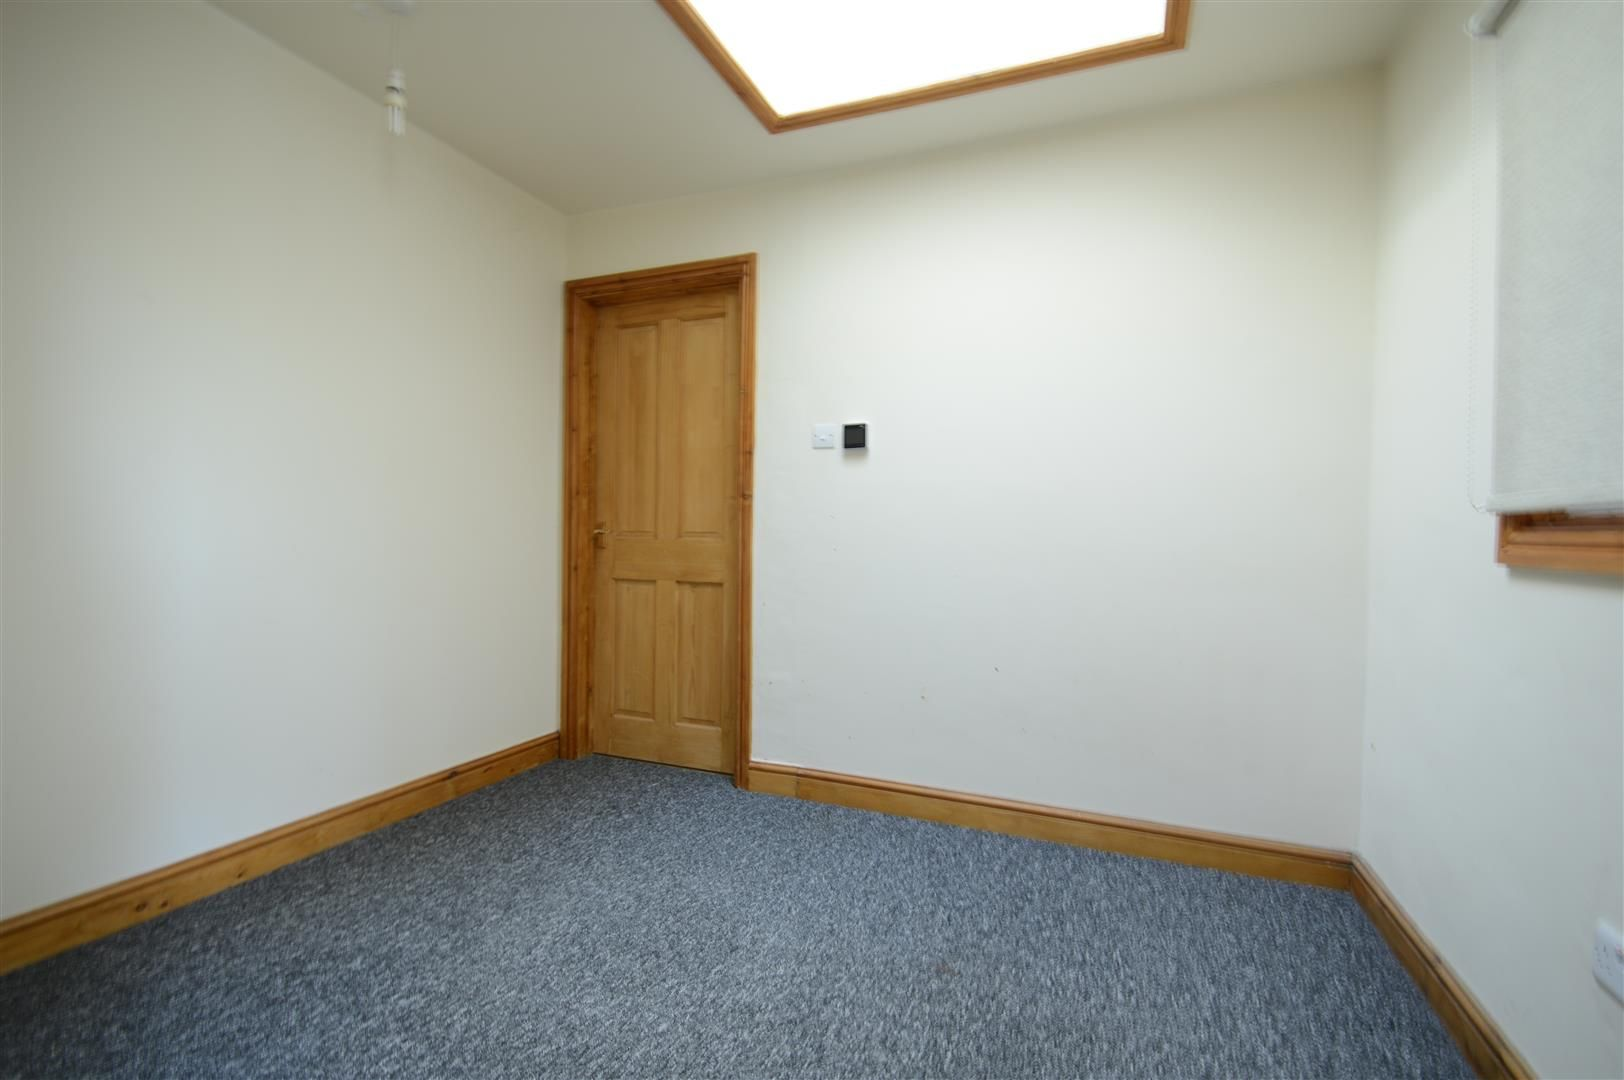 5 bed detached for sale in Sutton St. Nicholas 15